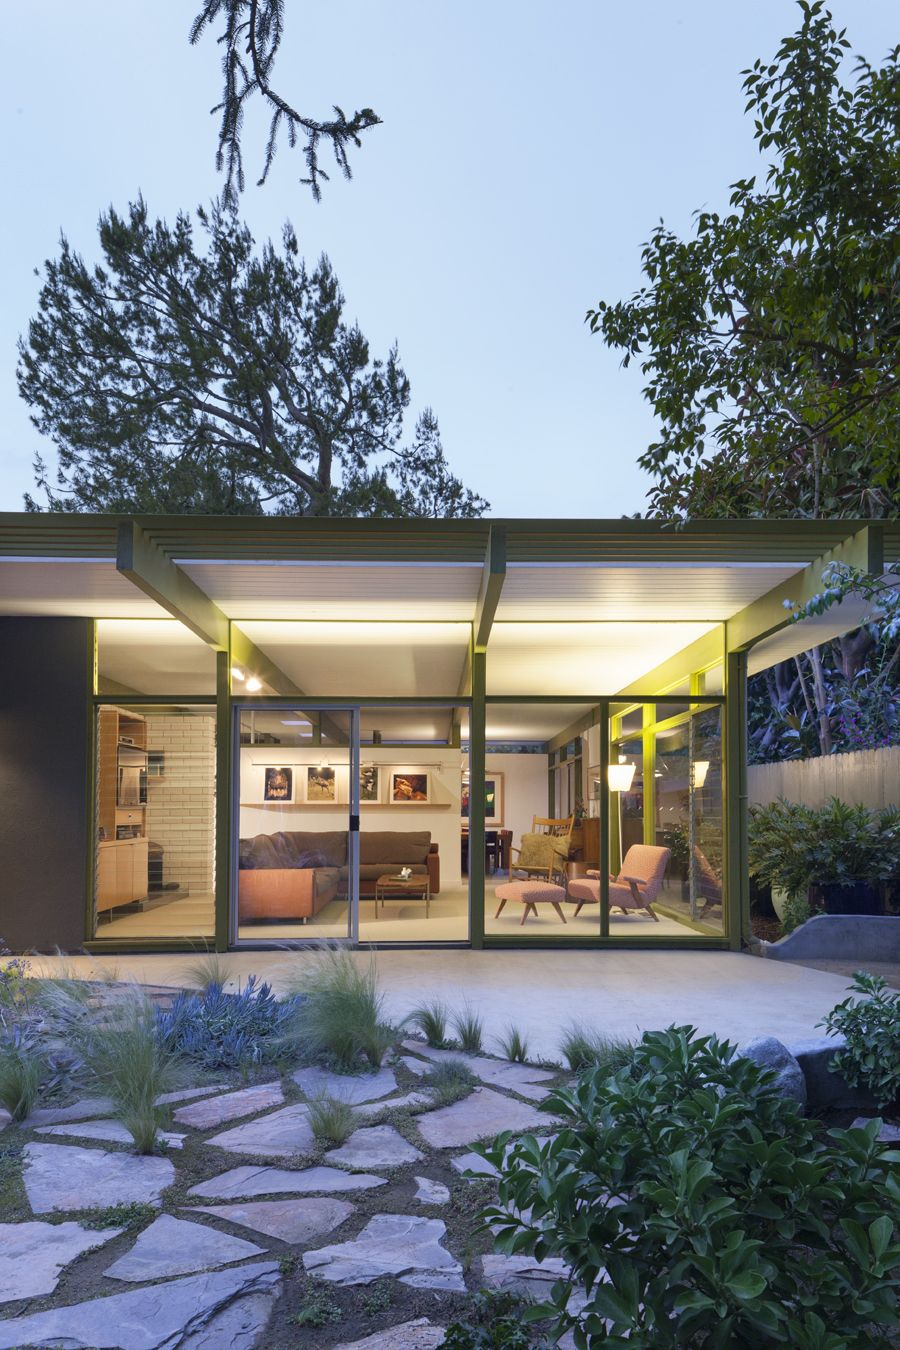 studio wumo is hiring - Freelance Architect / Designer - Local to LA ...